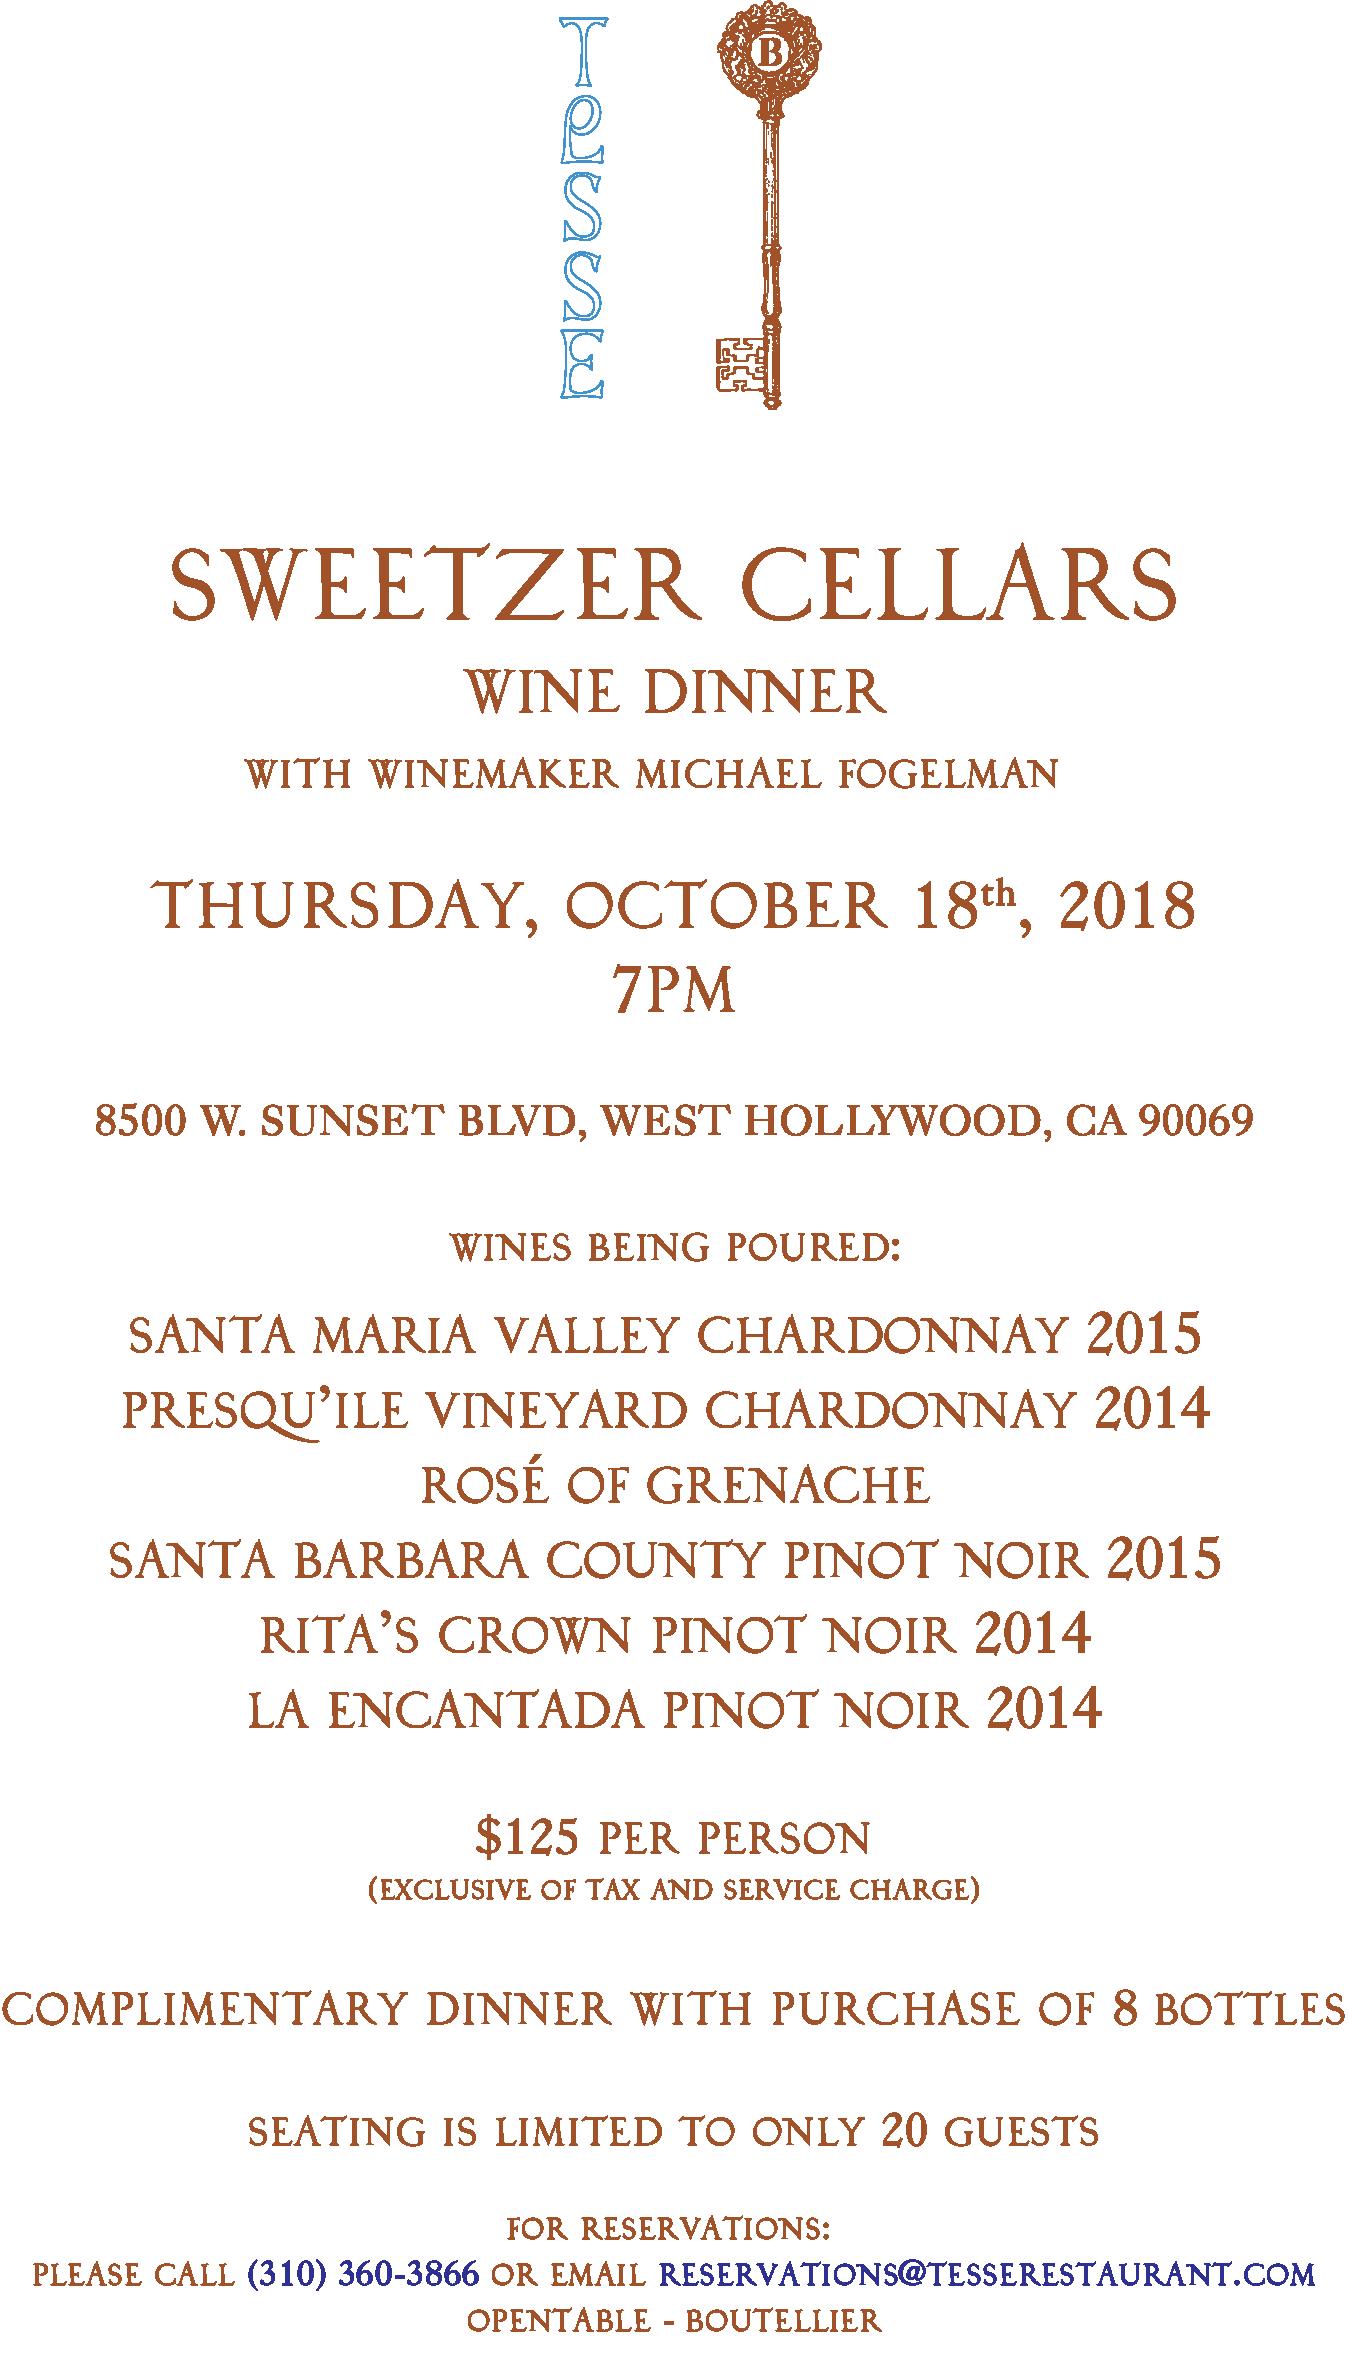 Sweetzer Cellars Wine Dinner Invite.png